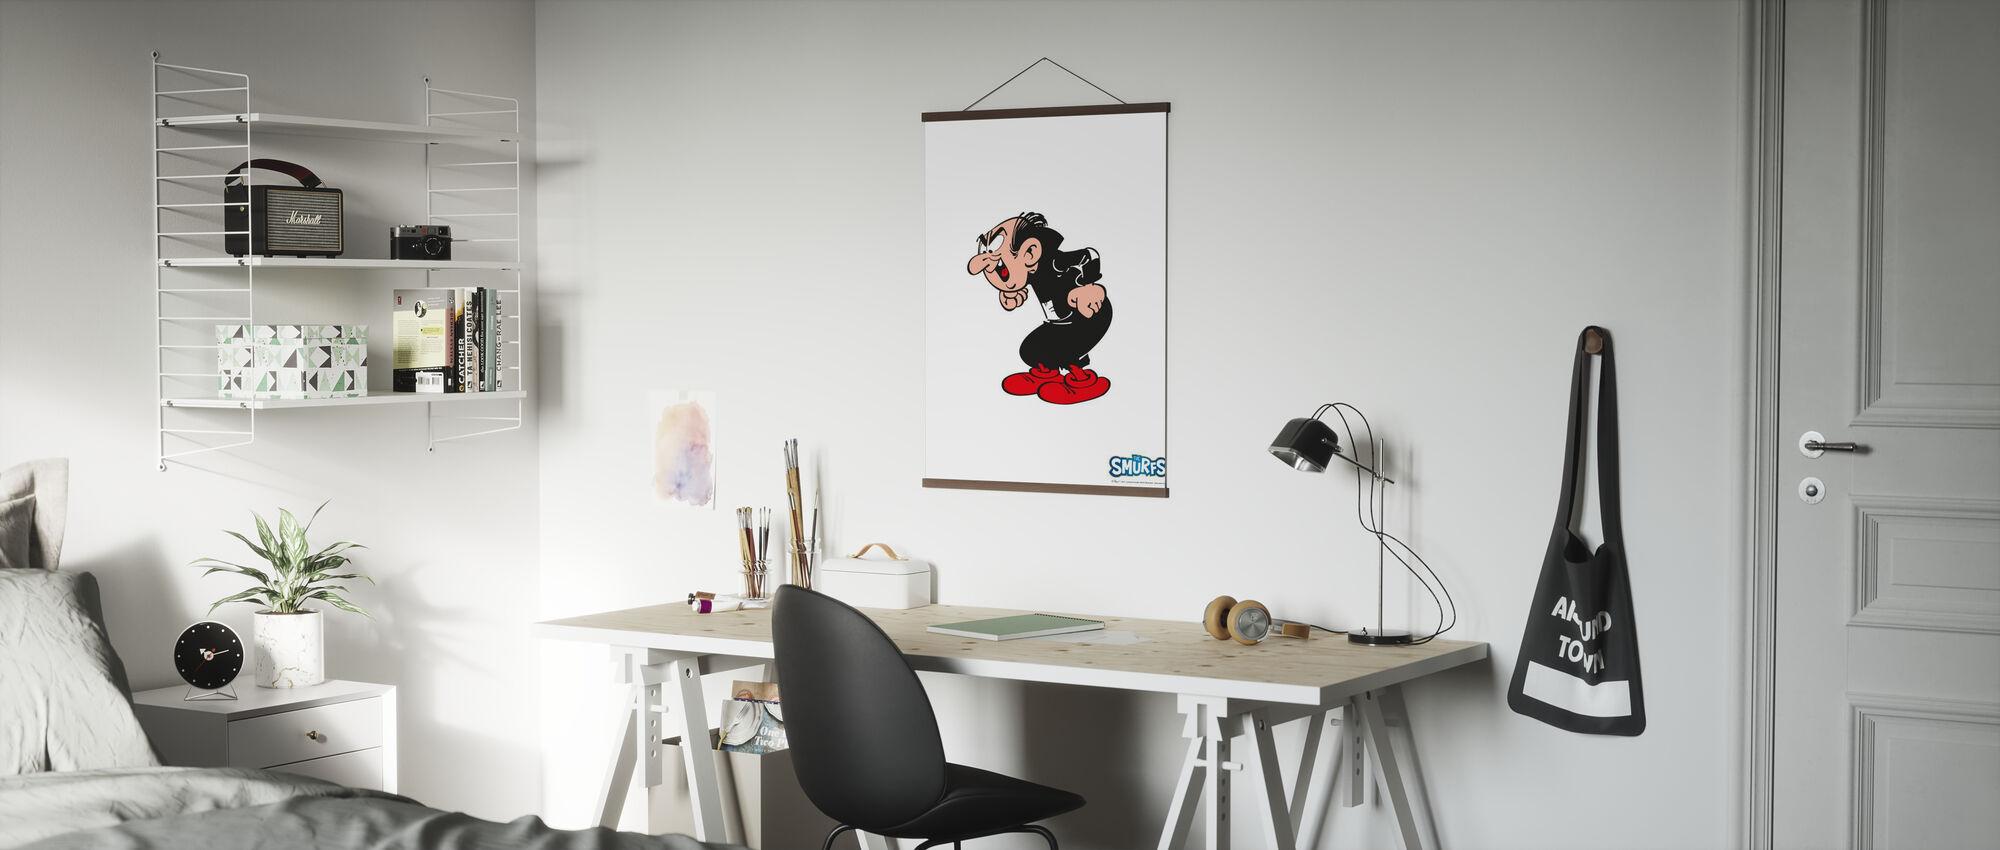 Smurfen - Gargamel - Poster - Kantoor